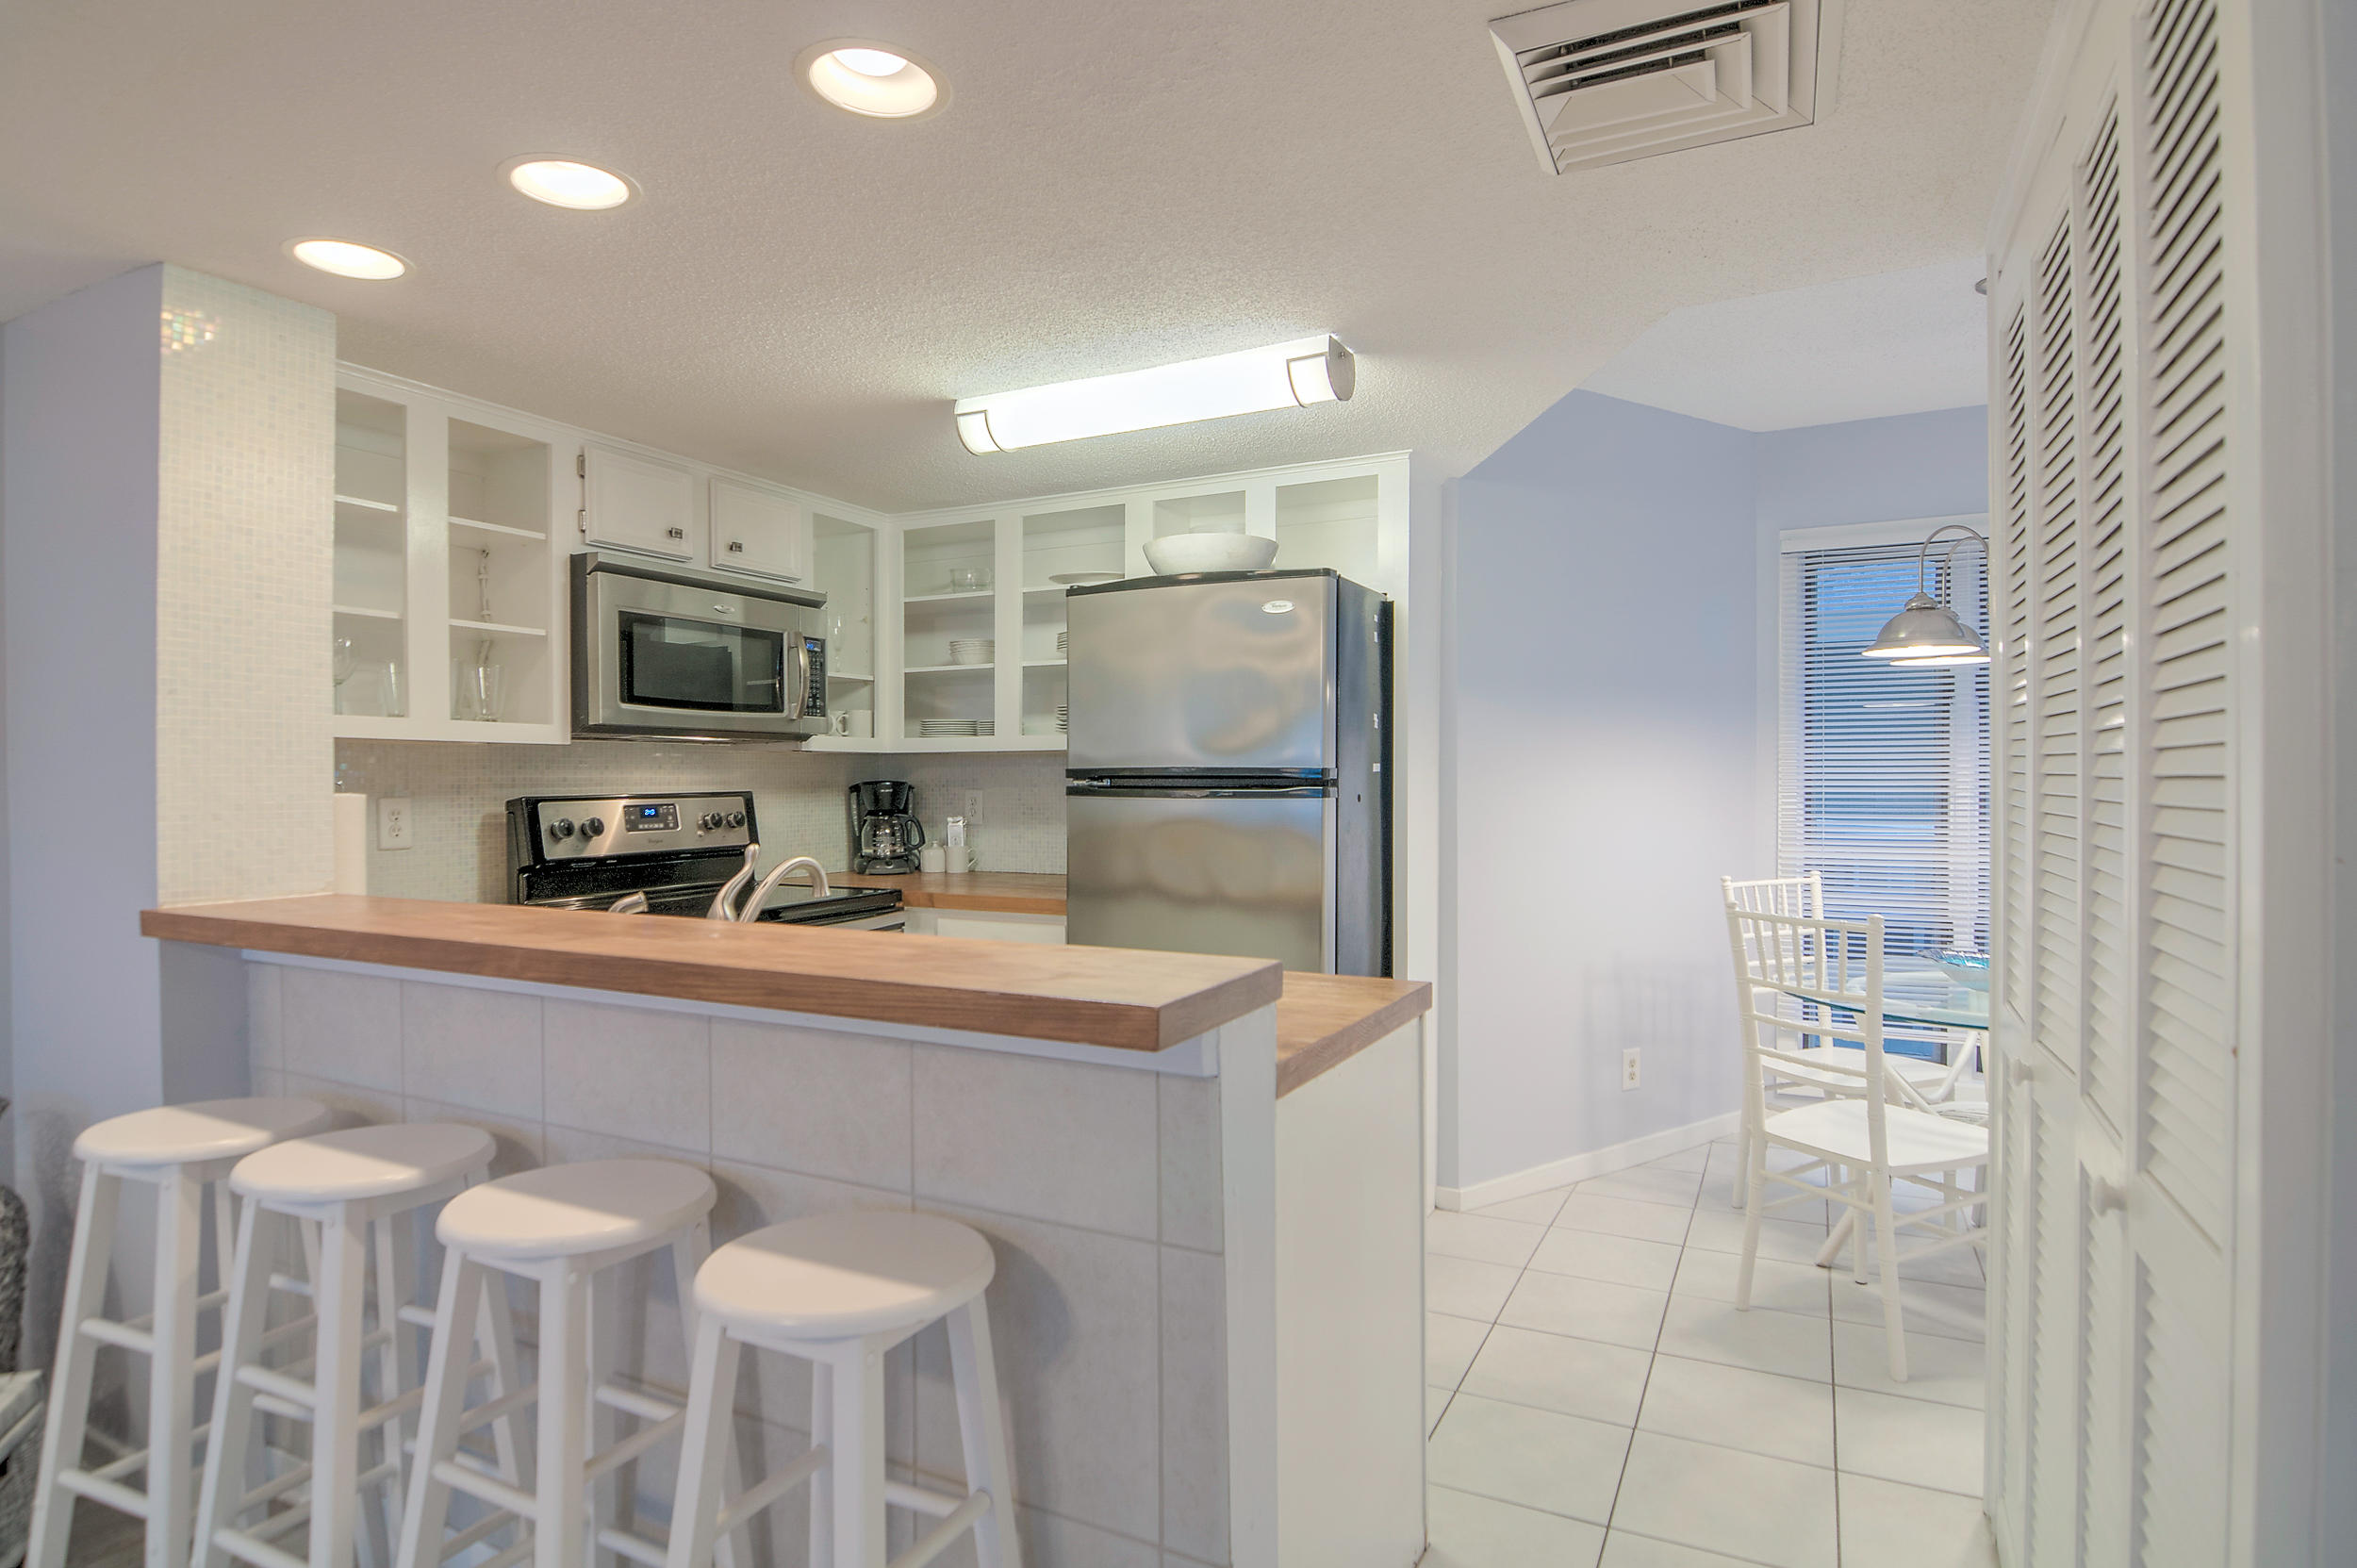 Port Ocall Homes For Sale - 103 Port O Call, Isle of Palms, SC - 4